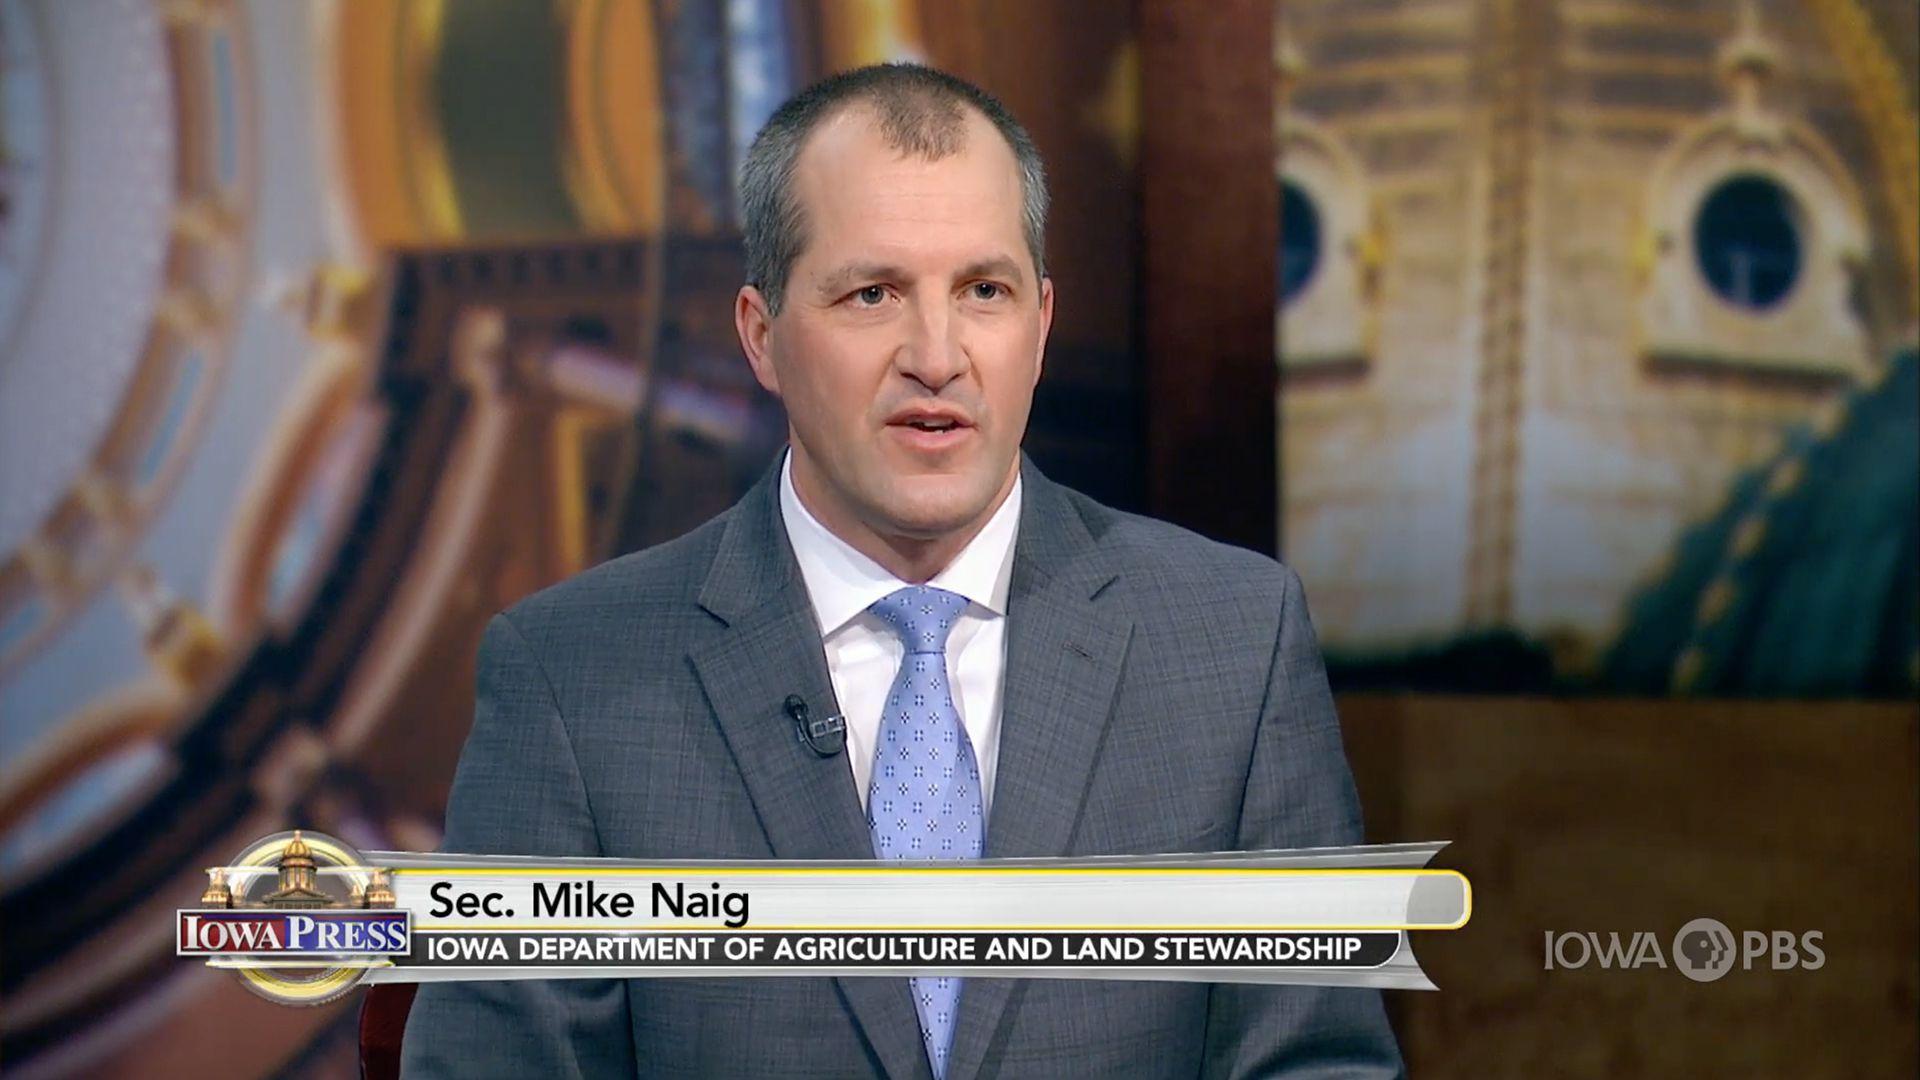 Iowa Secretary of Agriculture Mike Naig